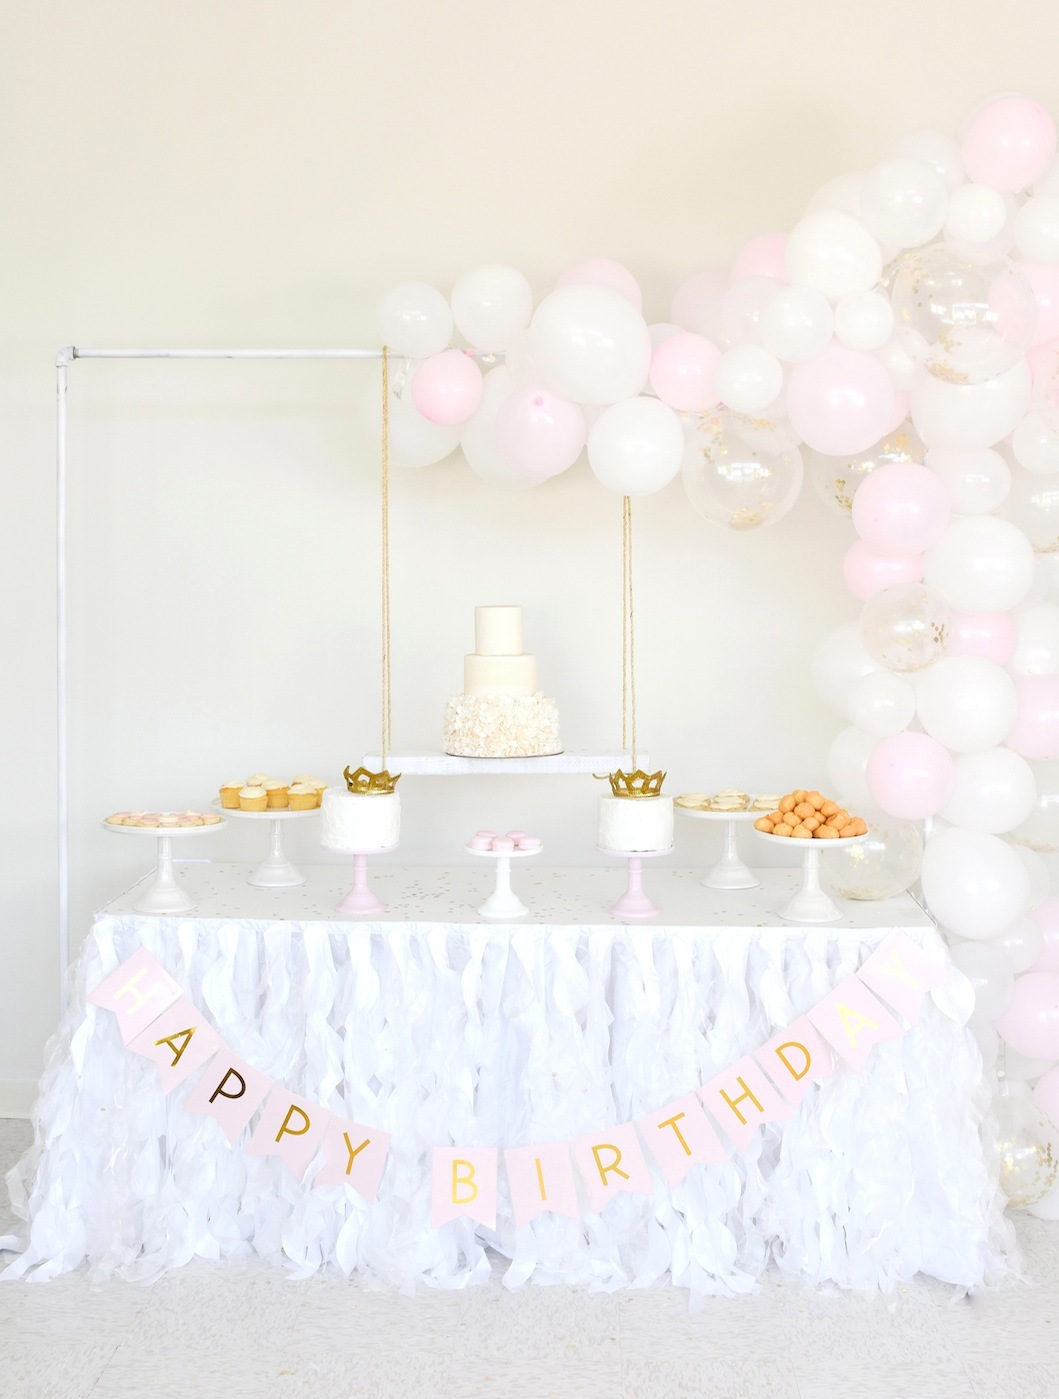 Swan party balloon  swan swan balloon swan party swan  swan birthday party balloons